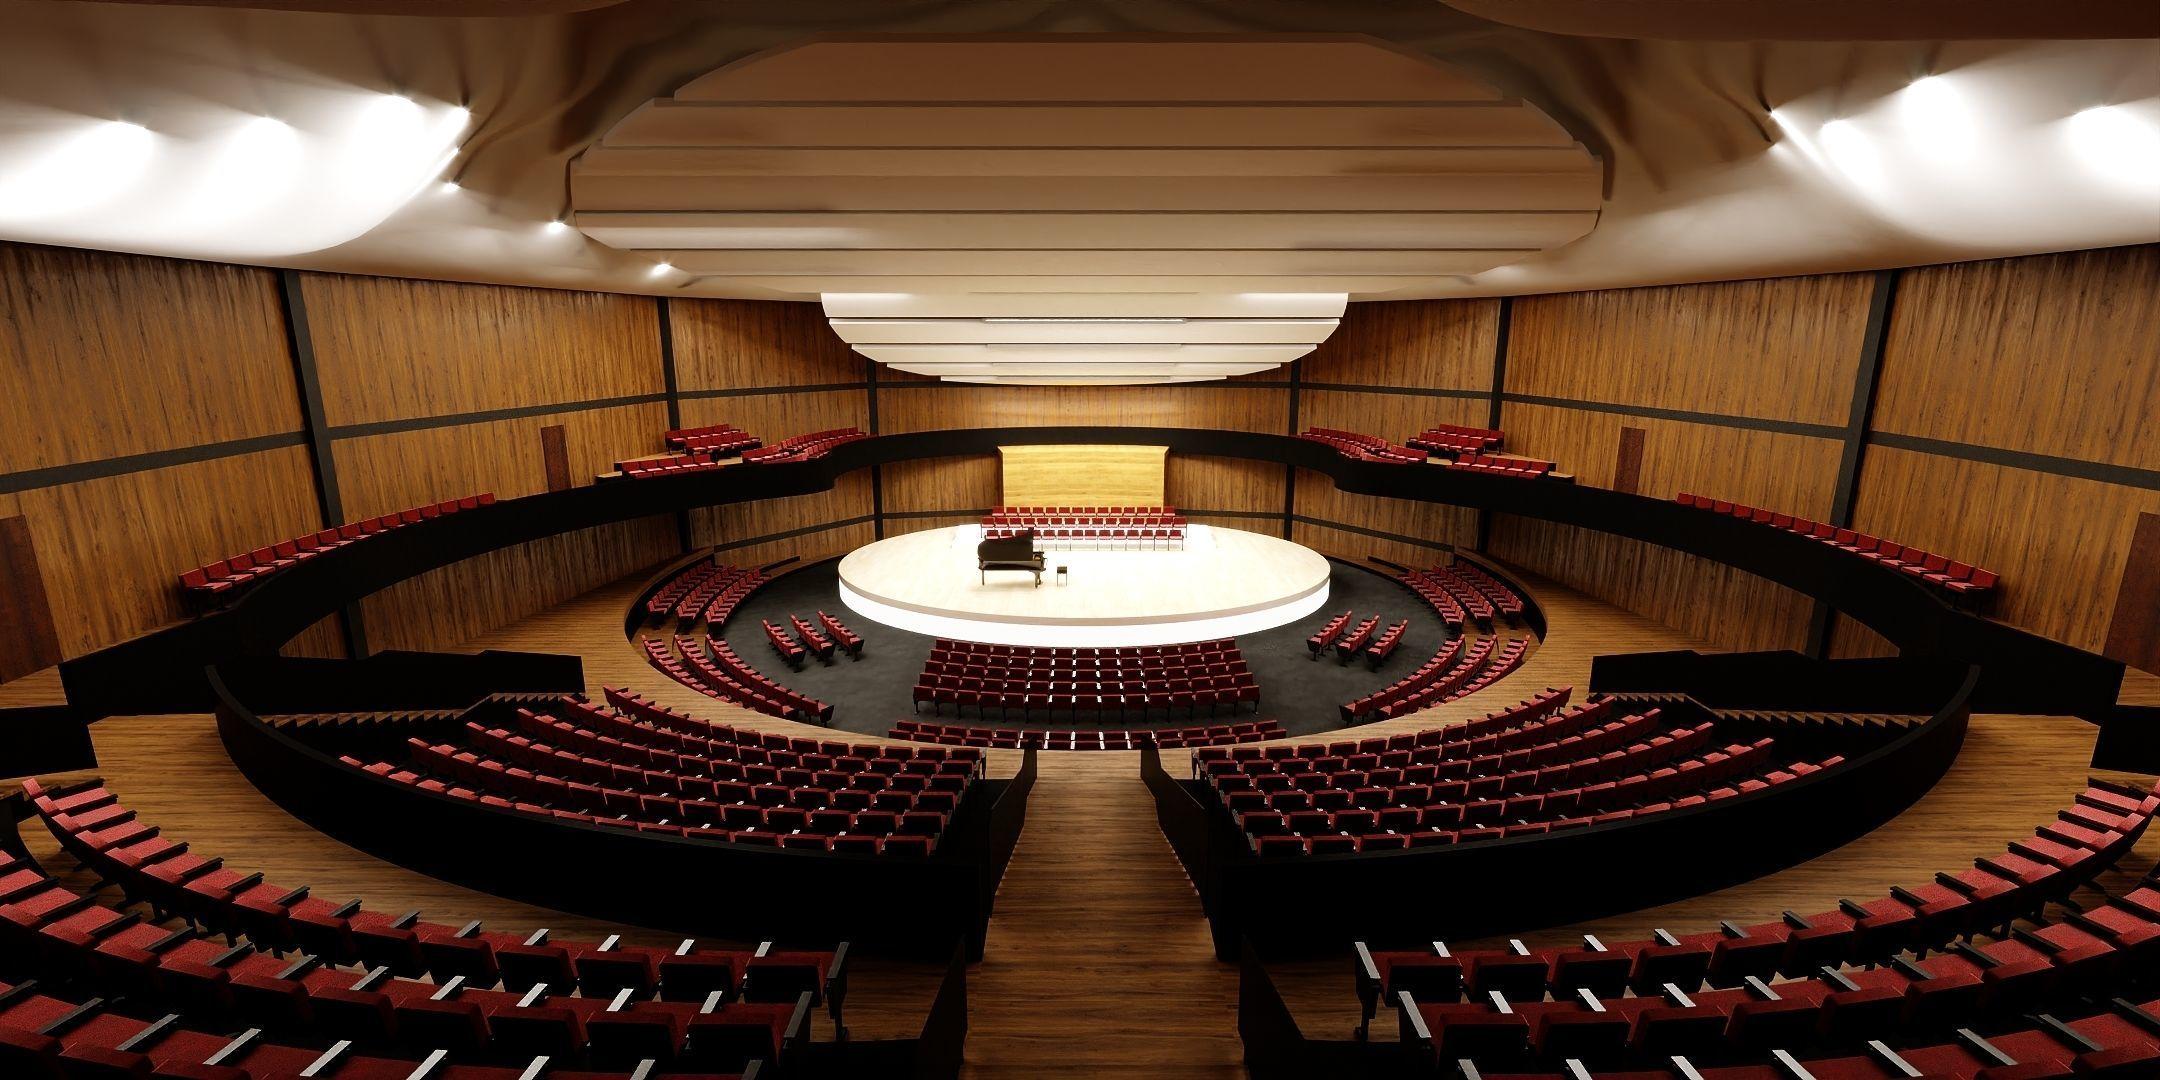 Concert Hall Amphitheater VR Baked Corona Max Scene